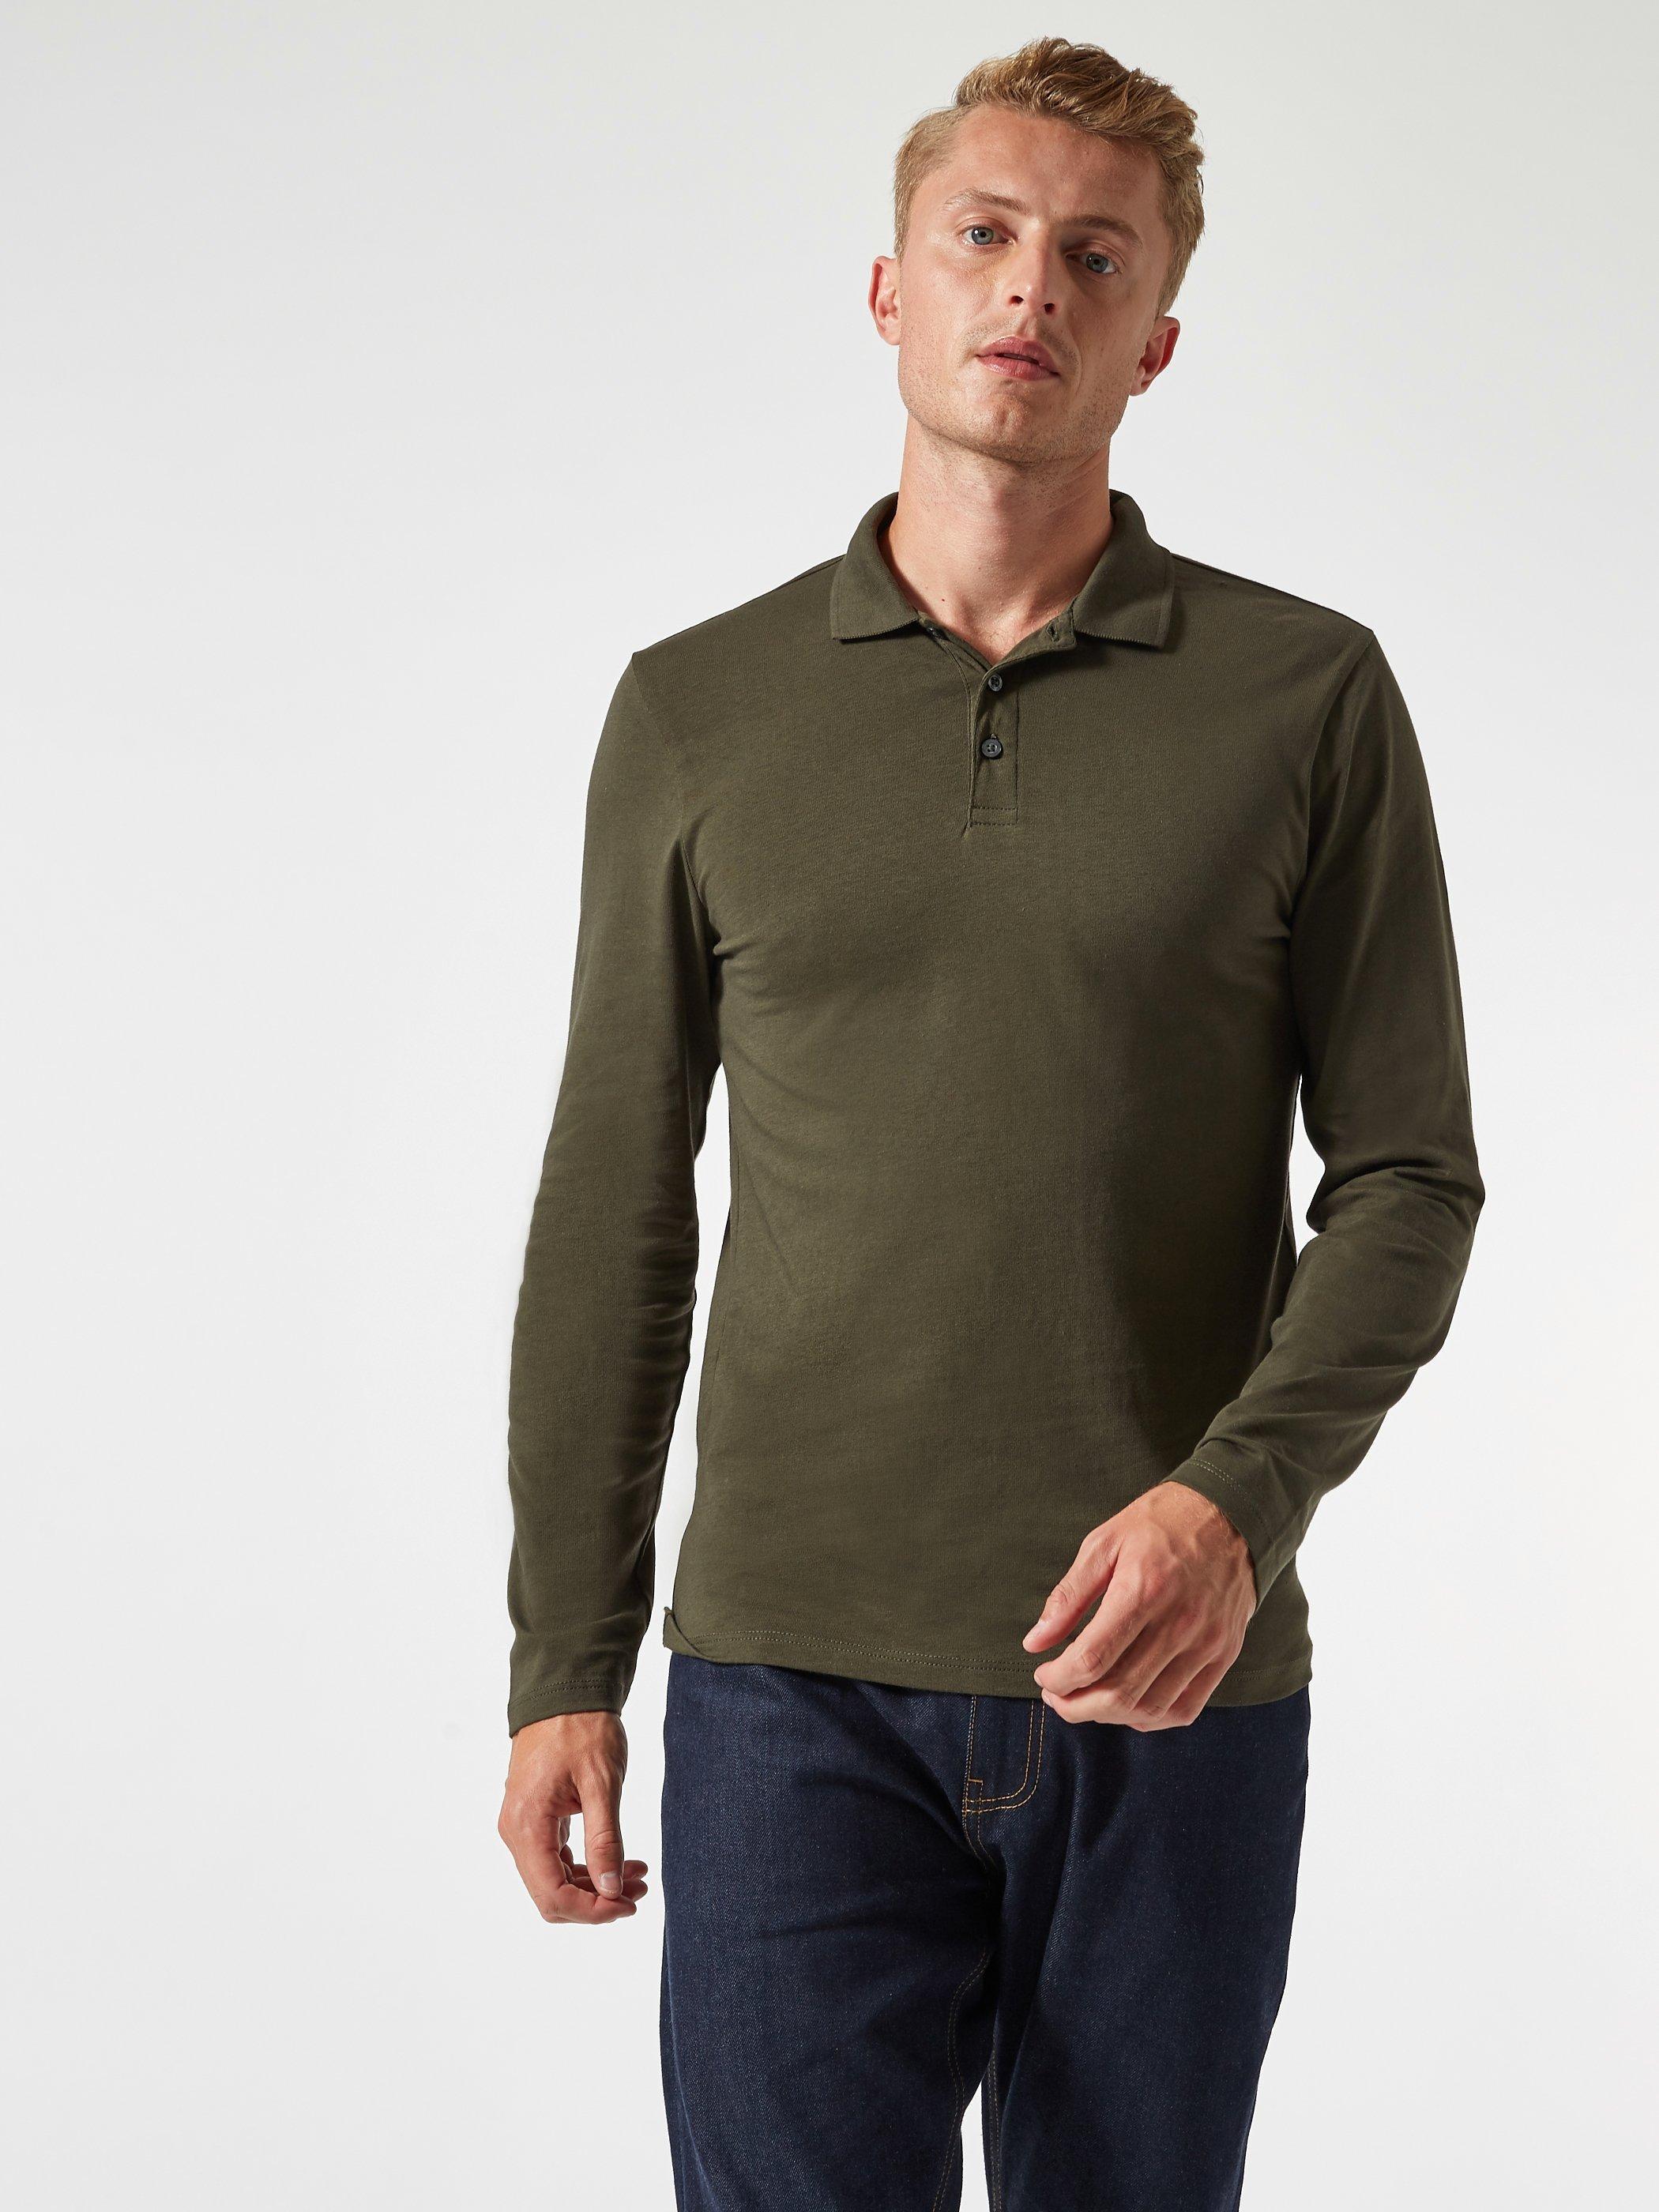 Men'S Dark Khaki Long Sleeved Muscle Fit Polo Shirt - S